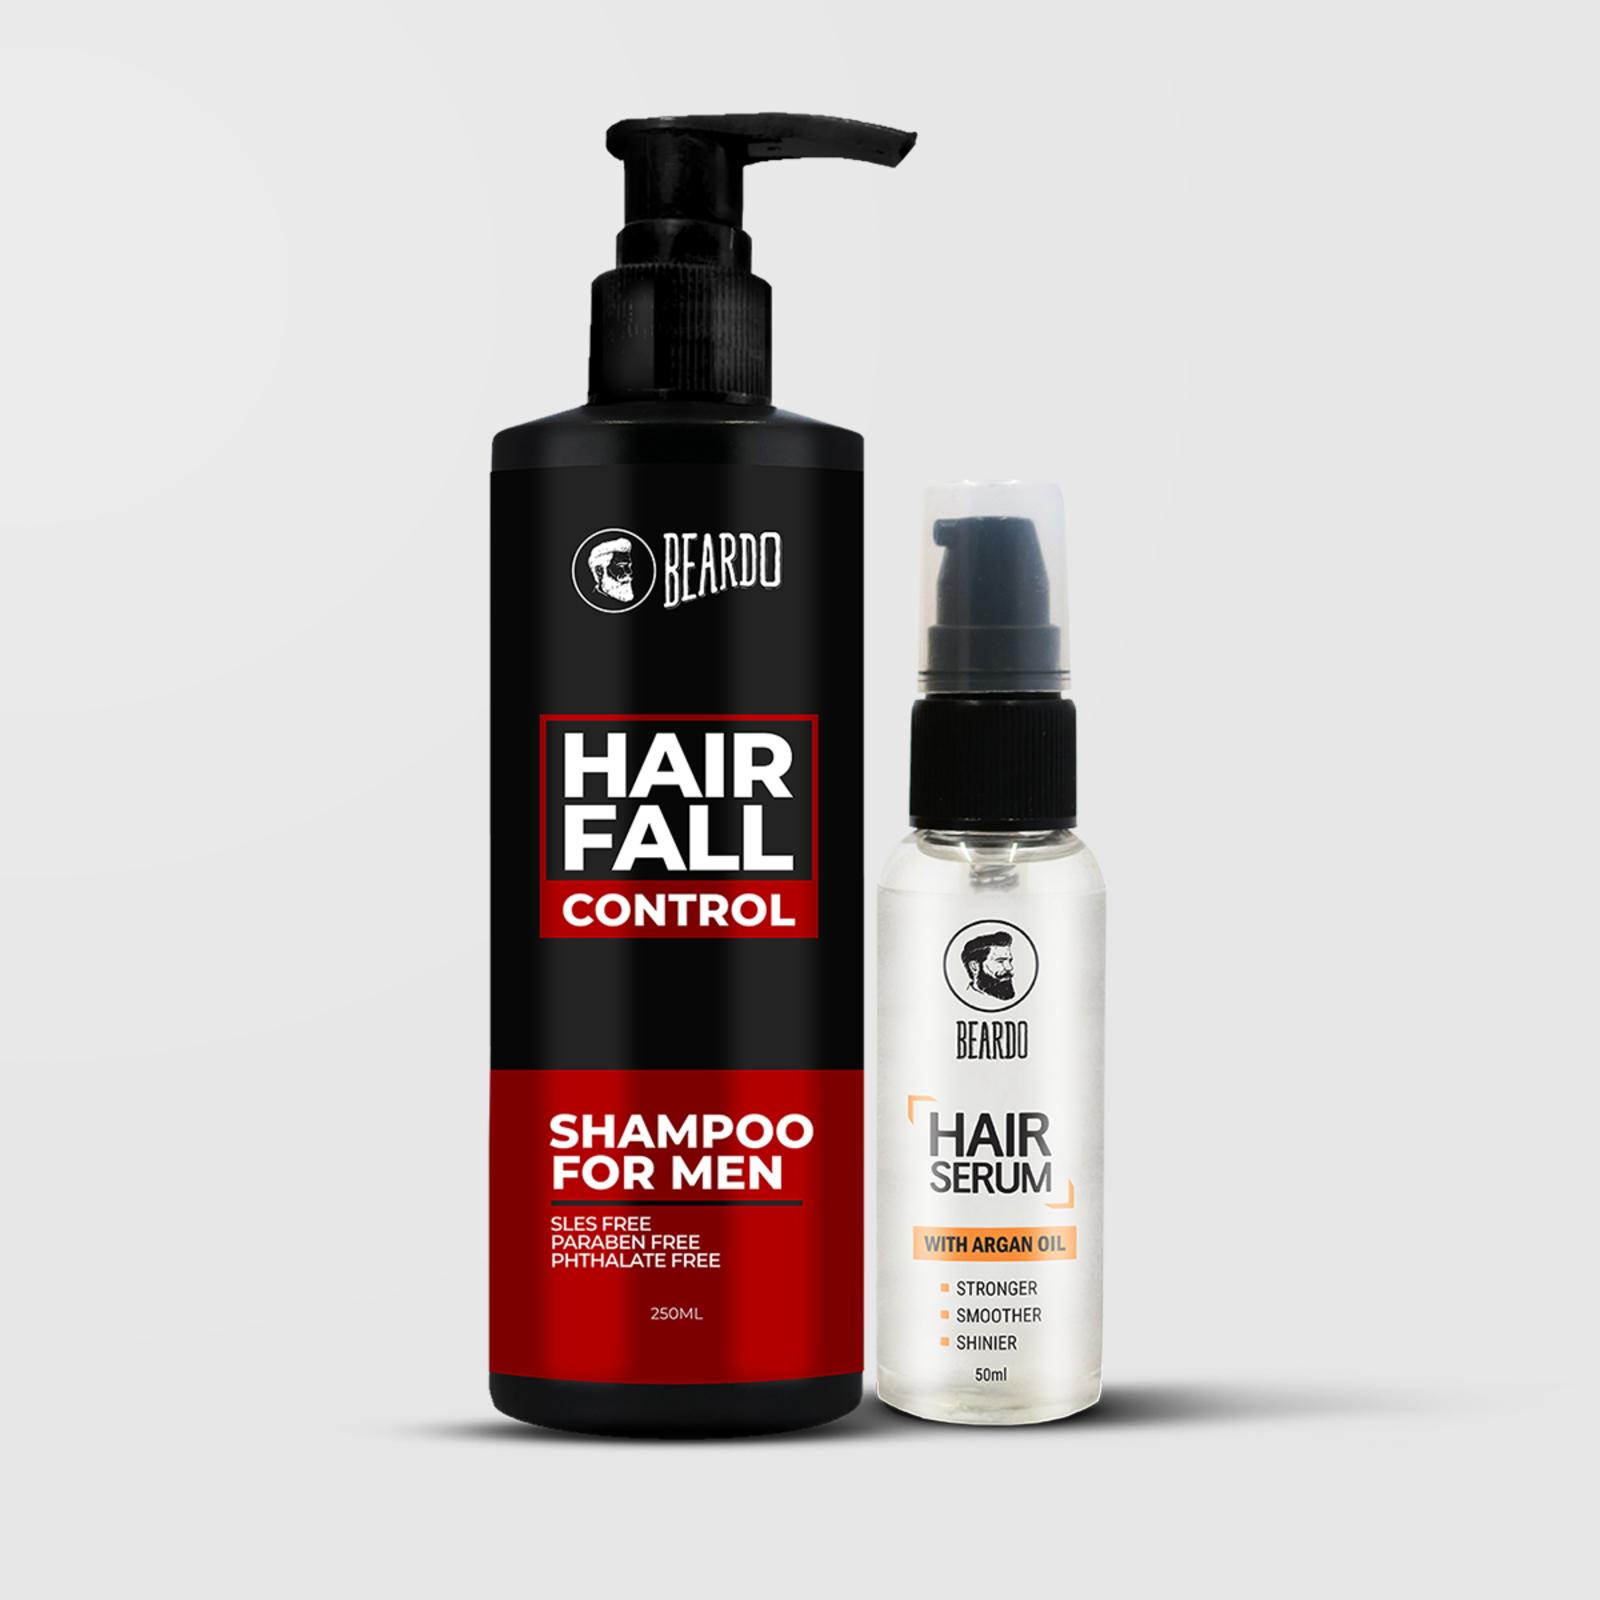 Beardo Daily Hair Regime Combo